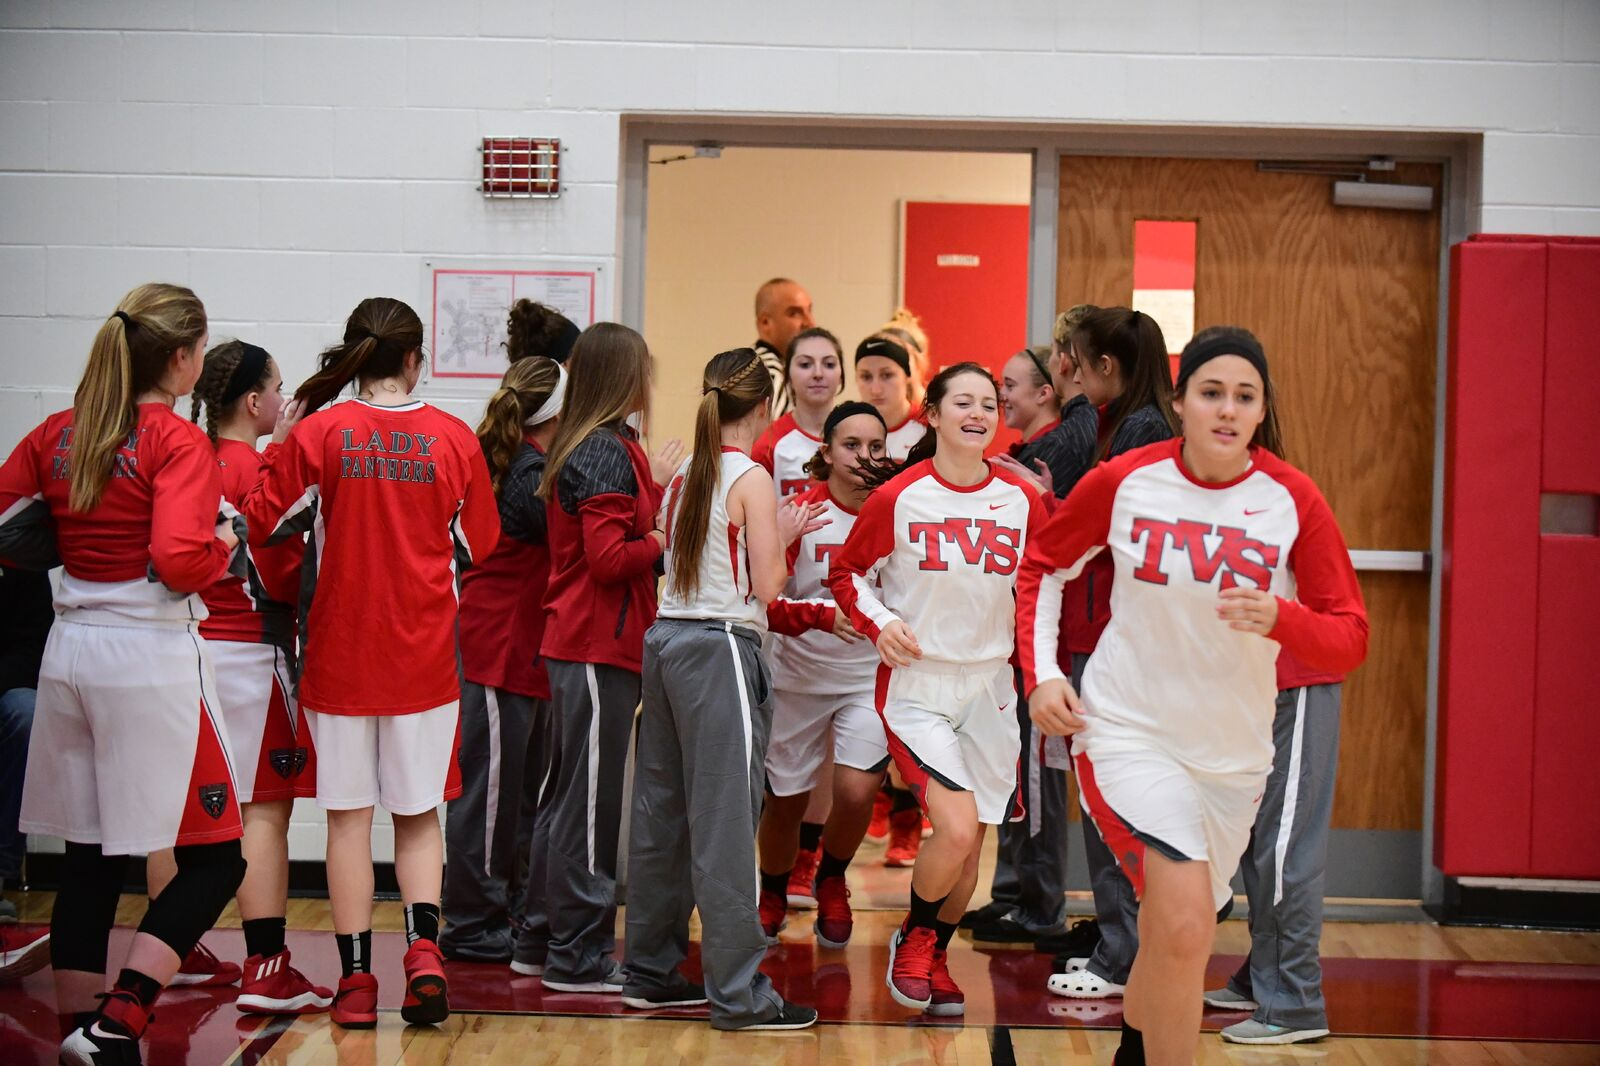 The girls Varsity team takes the floor.